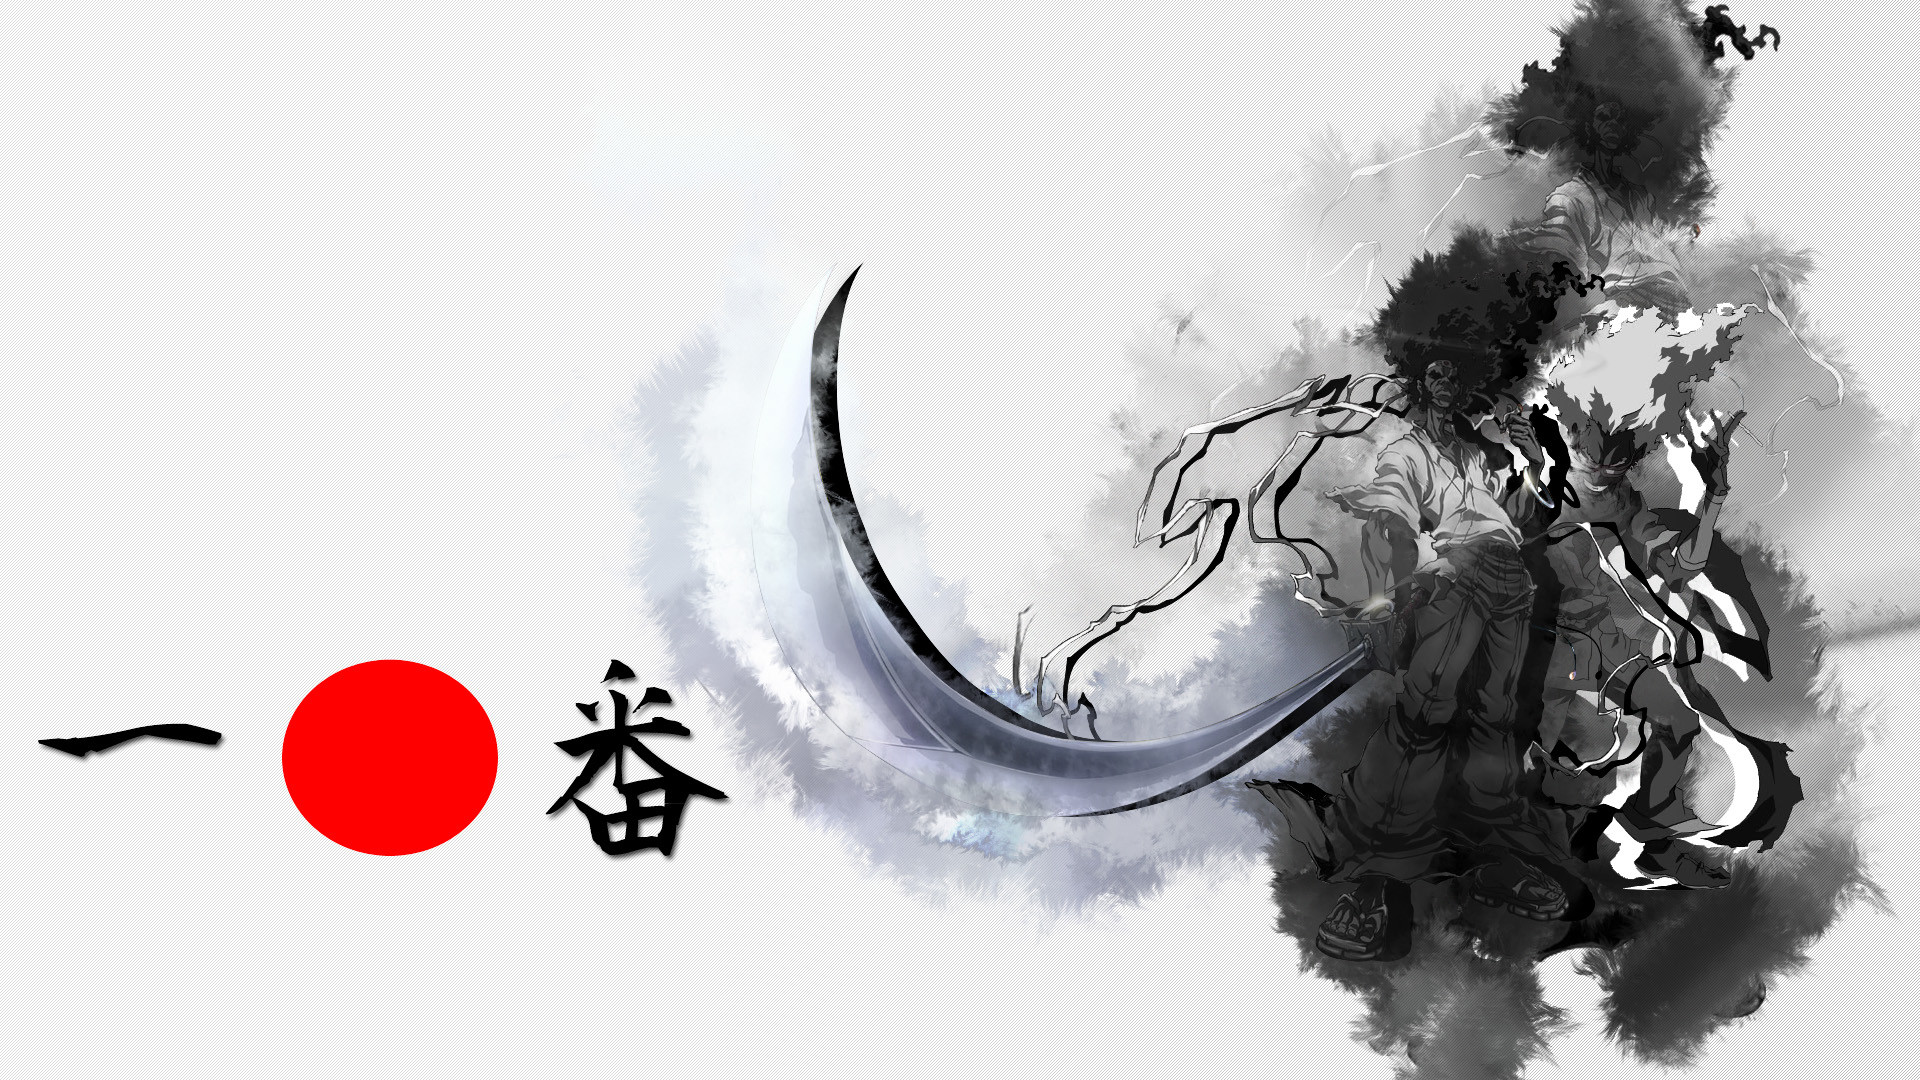 Anime samurai girl wallpaper 72 images - Anime backgrounds hd 1920x1080 ...